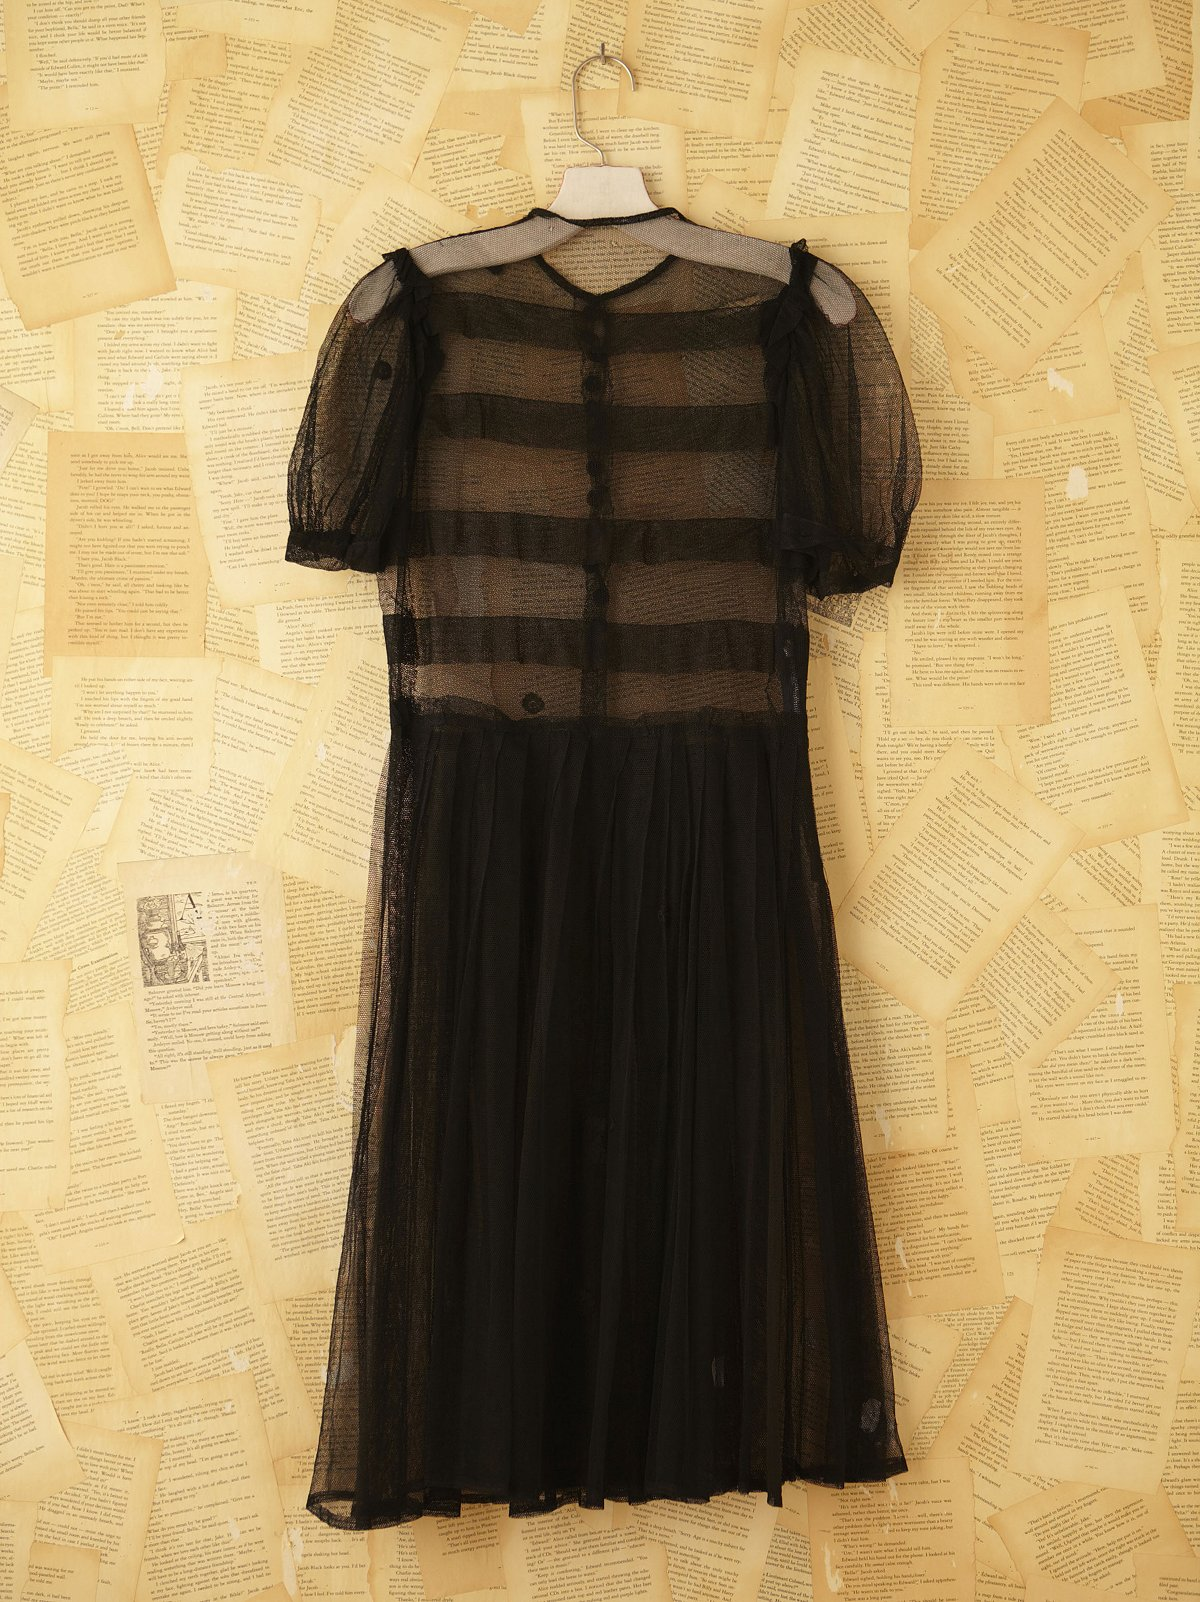 Vintage 1940's Sheer Net Dress